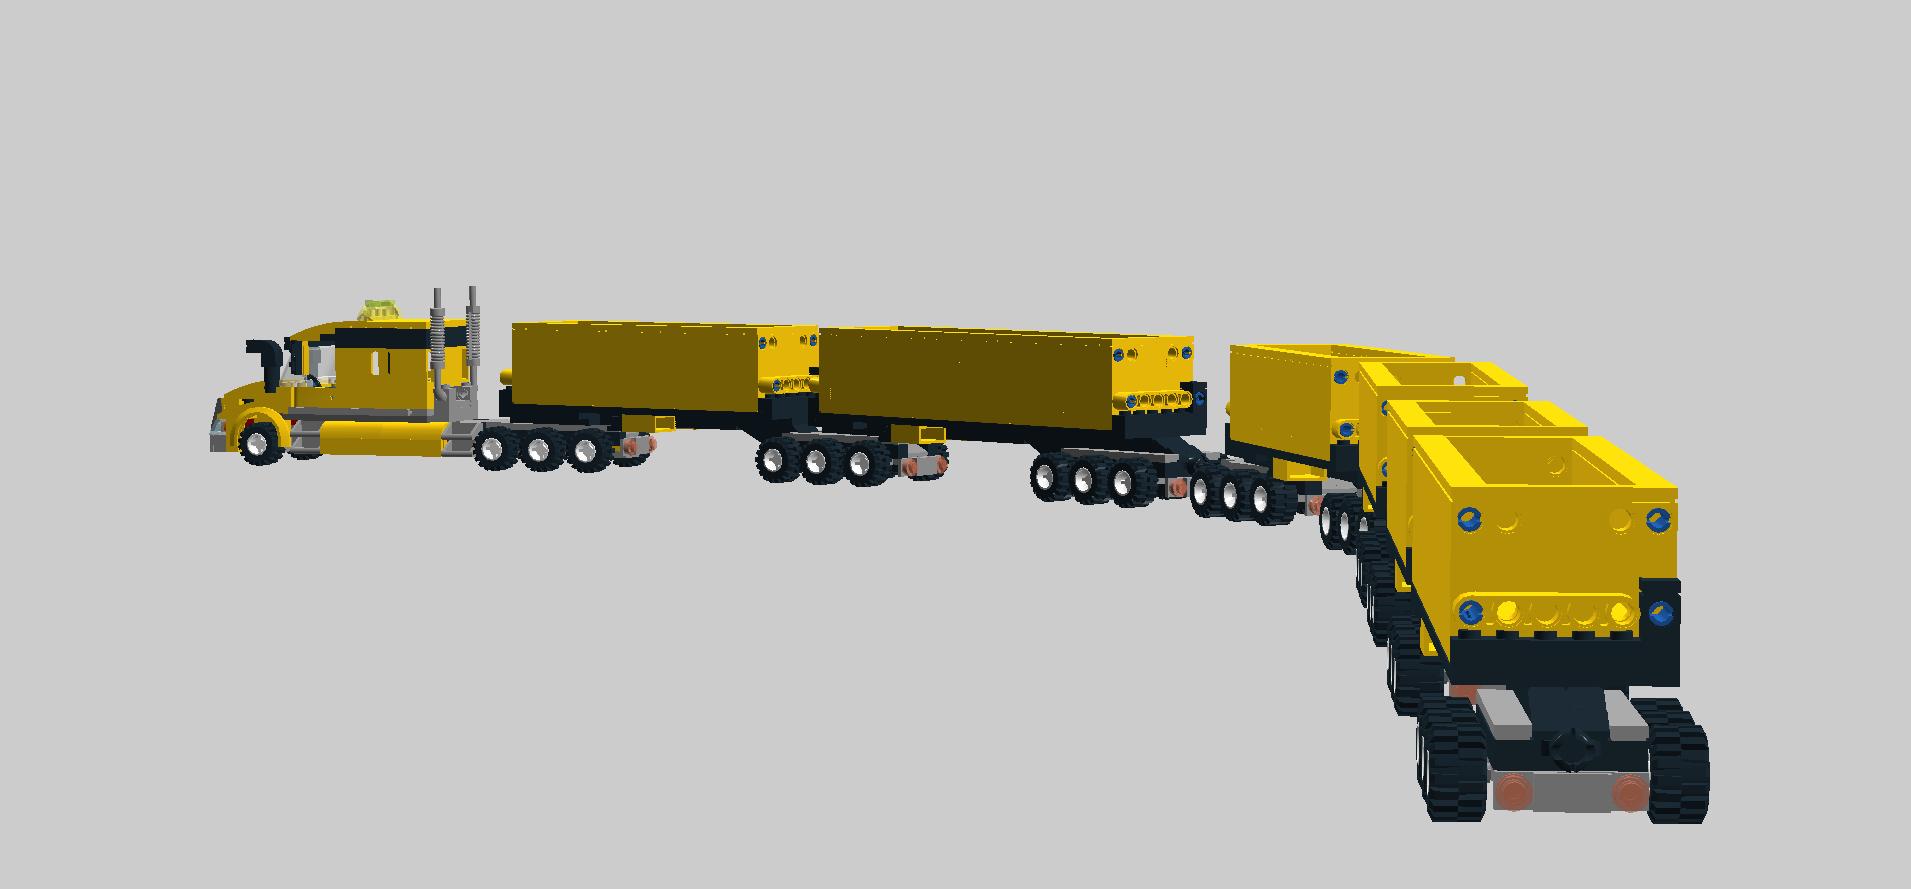 roadtrain_1_final_6t_7.png